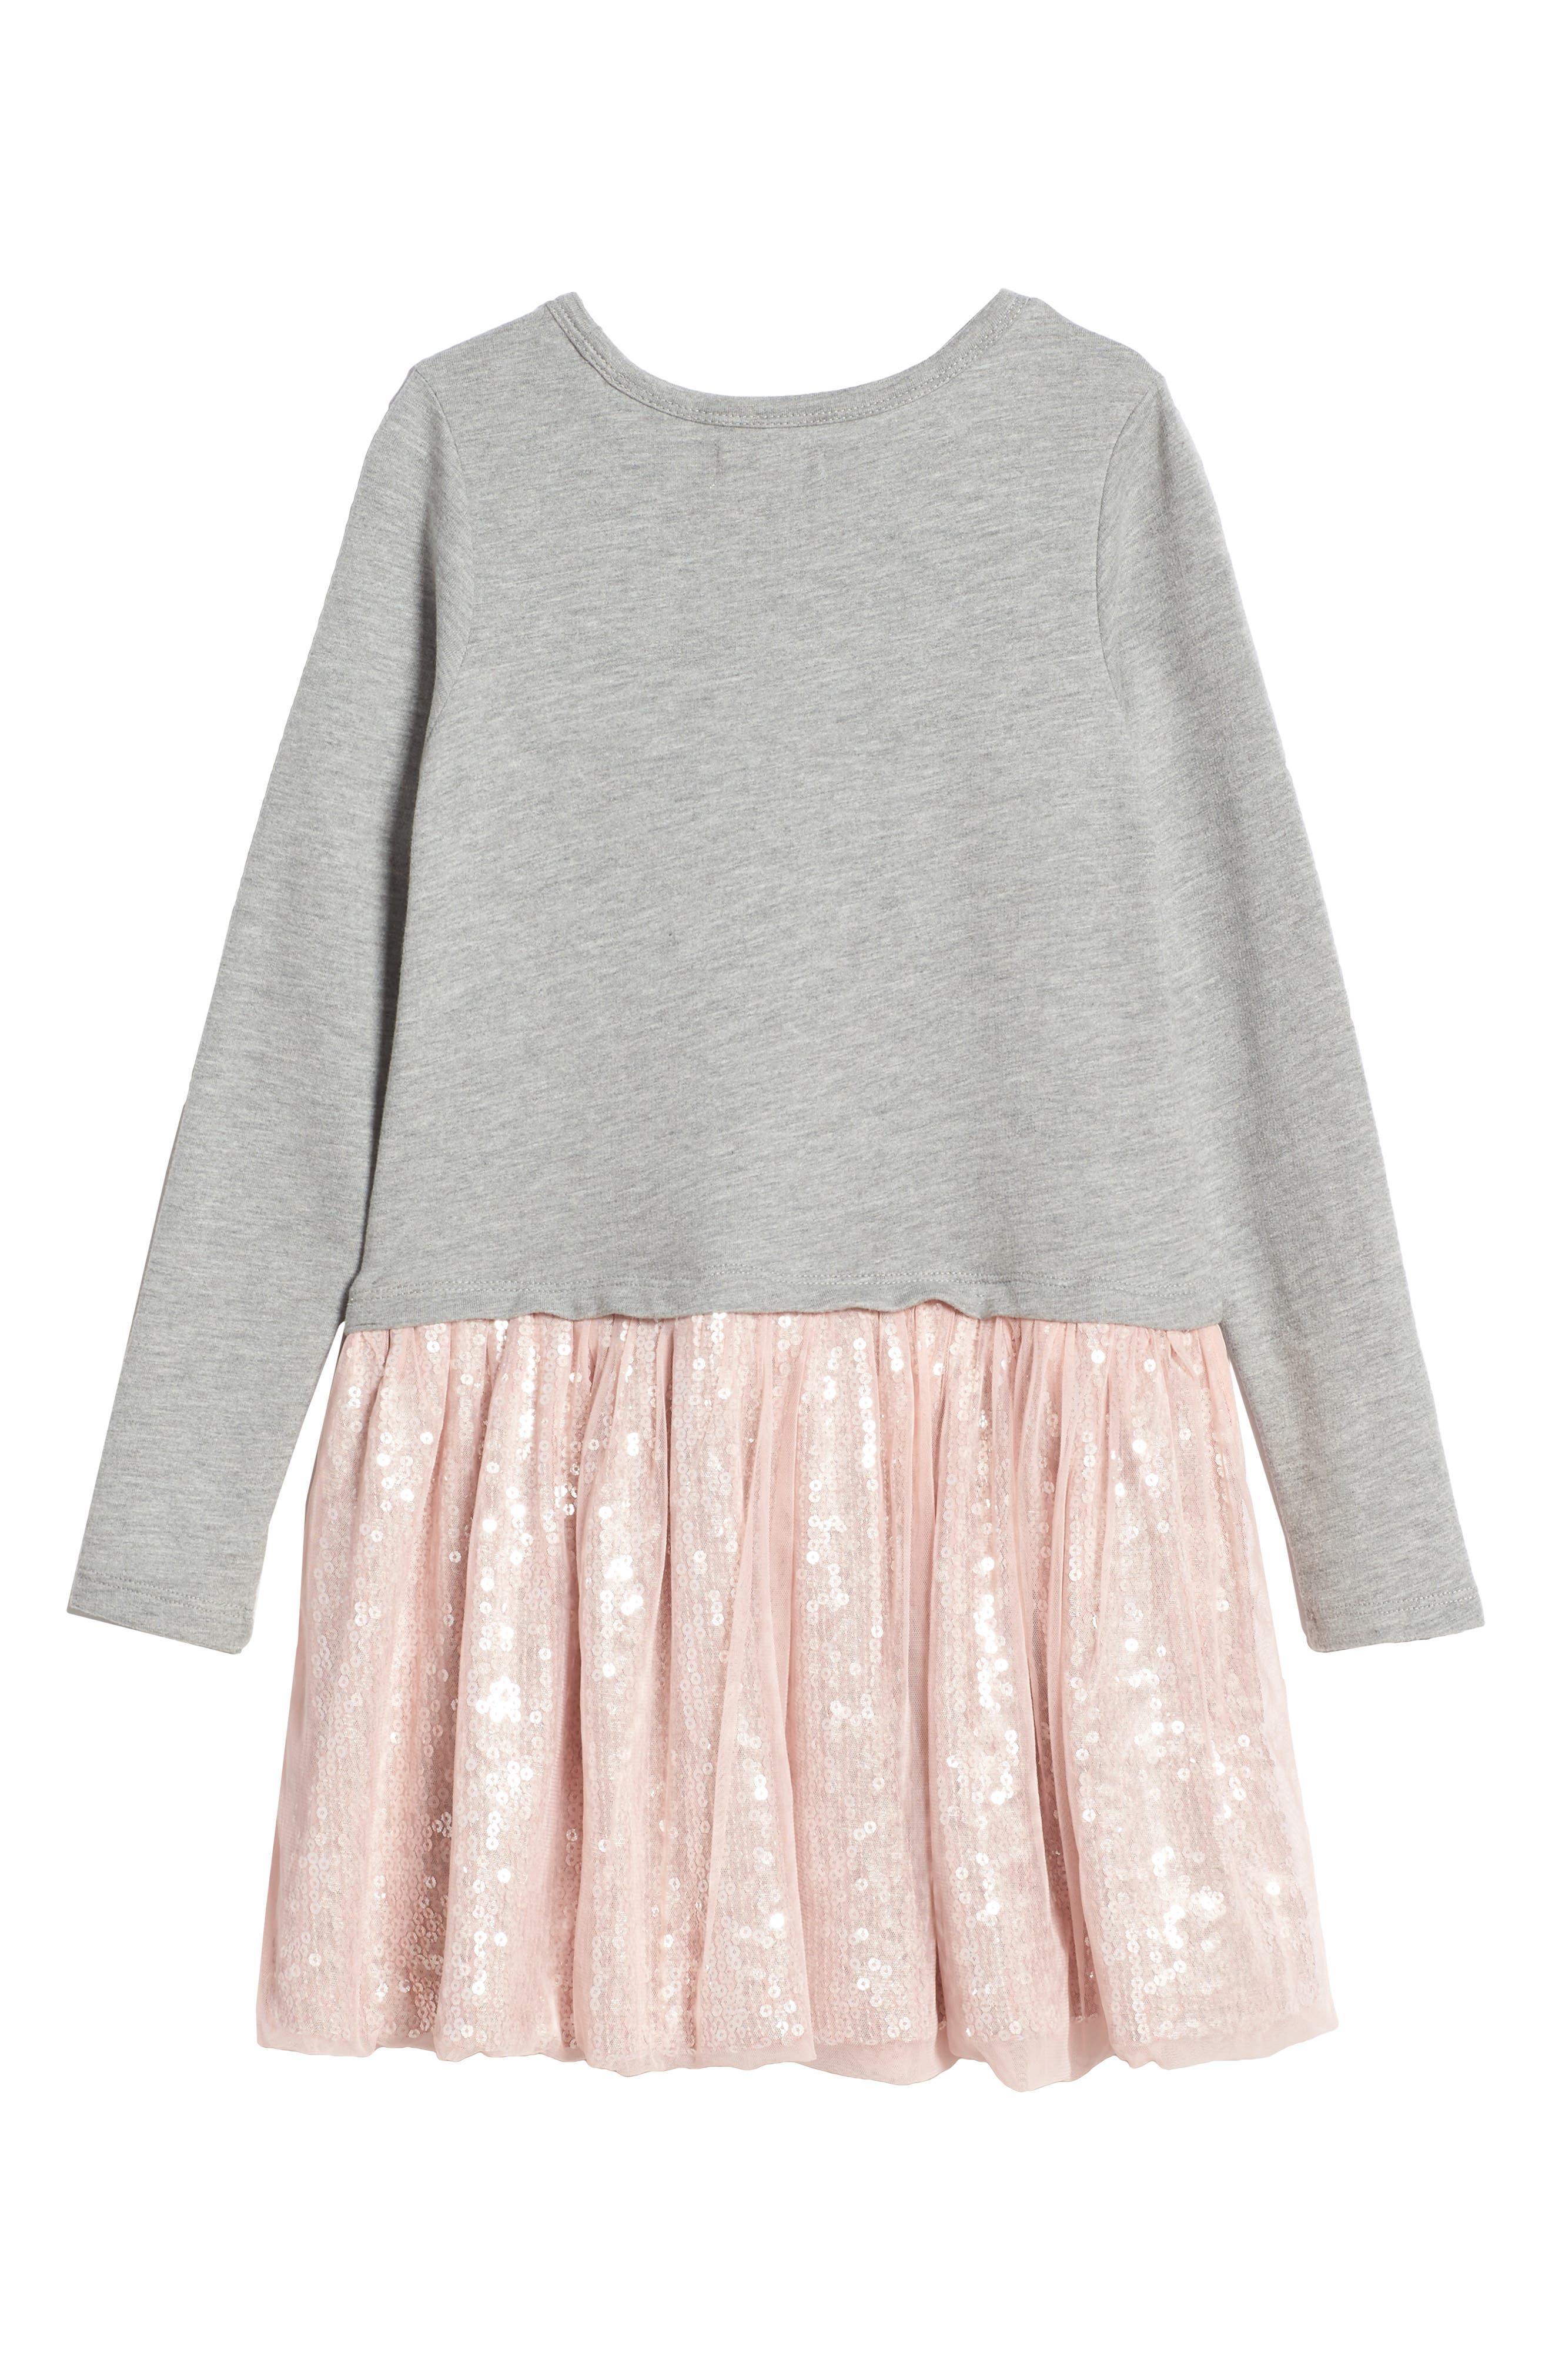 Sequin Tutu Dress,                             Alternate thumbnail 2, color,                             Grey Medium Heather Swan